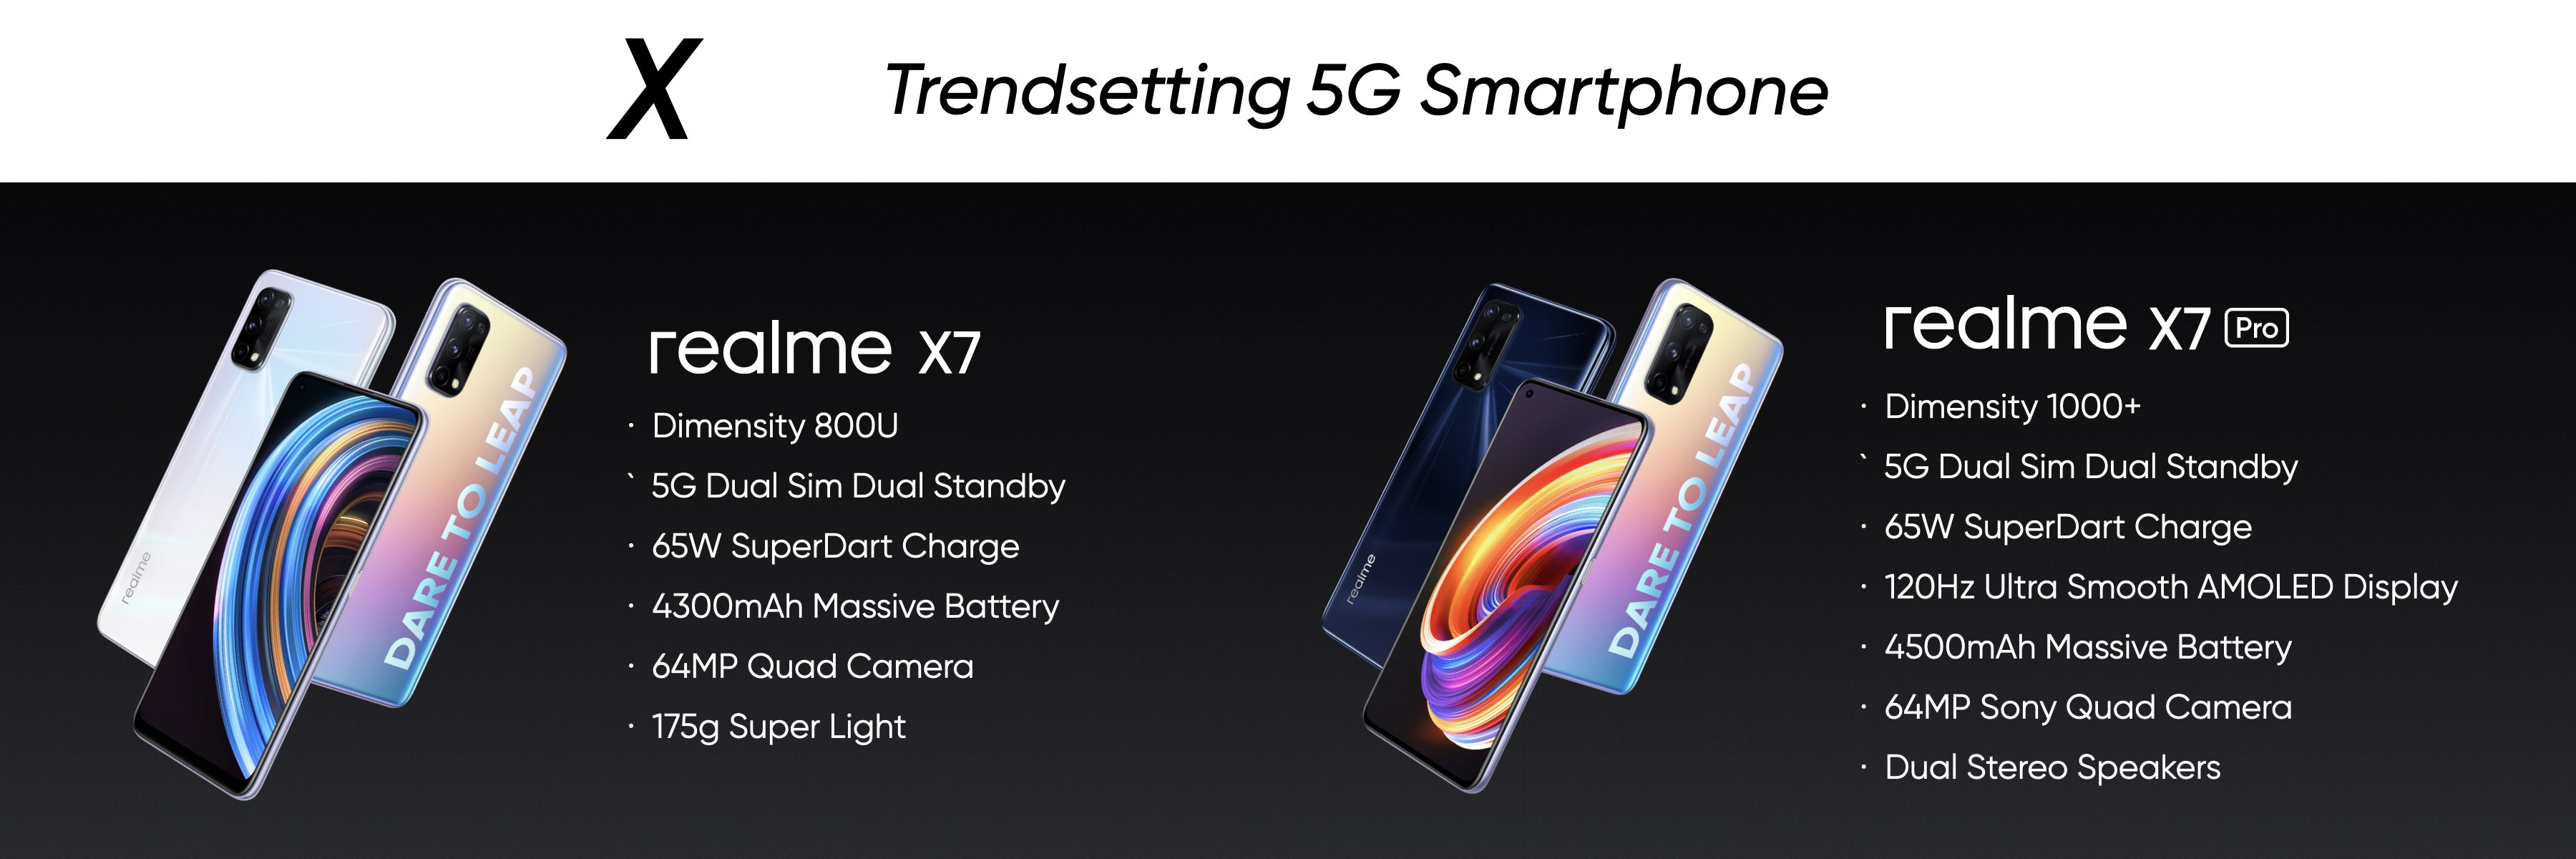 05_【5G產品線】realme X系列,潮玩性能5G旗艦。